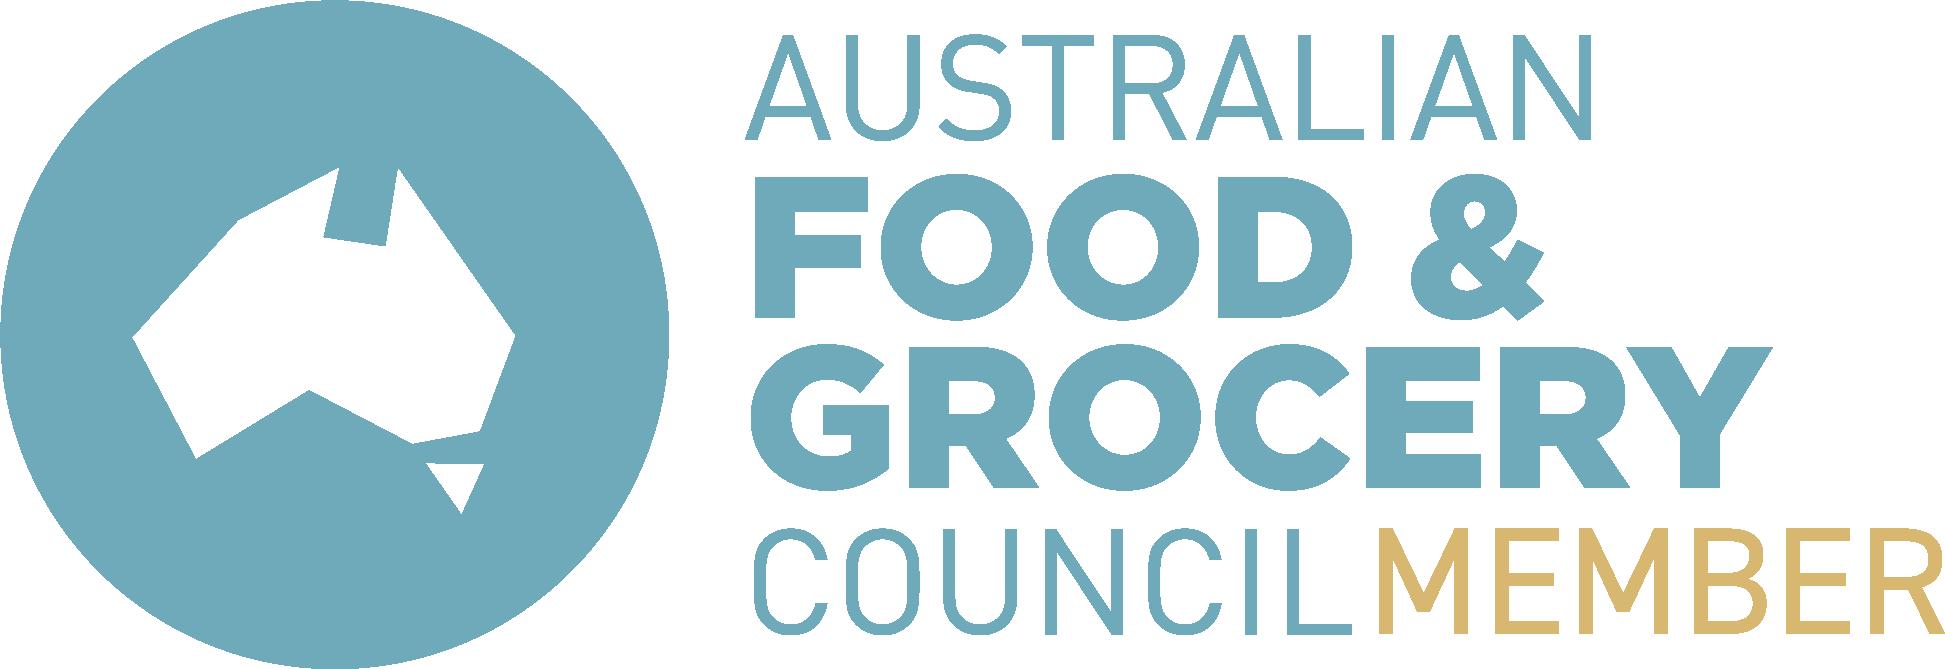 Australian Food & Grocery Council logo